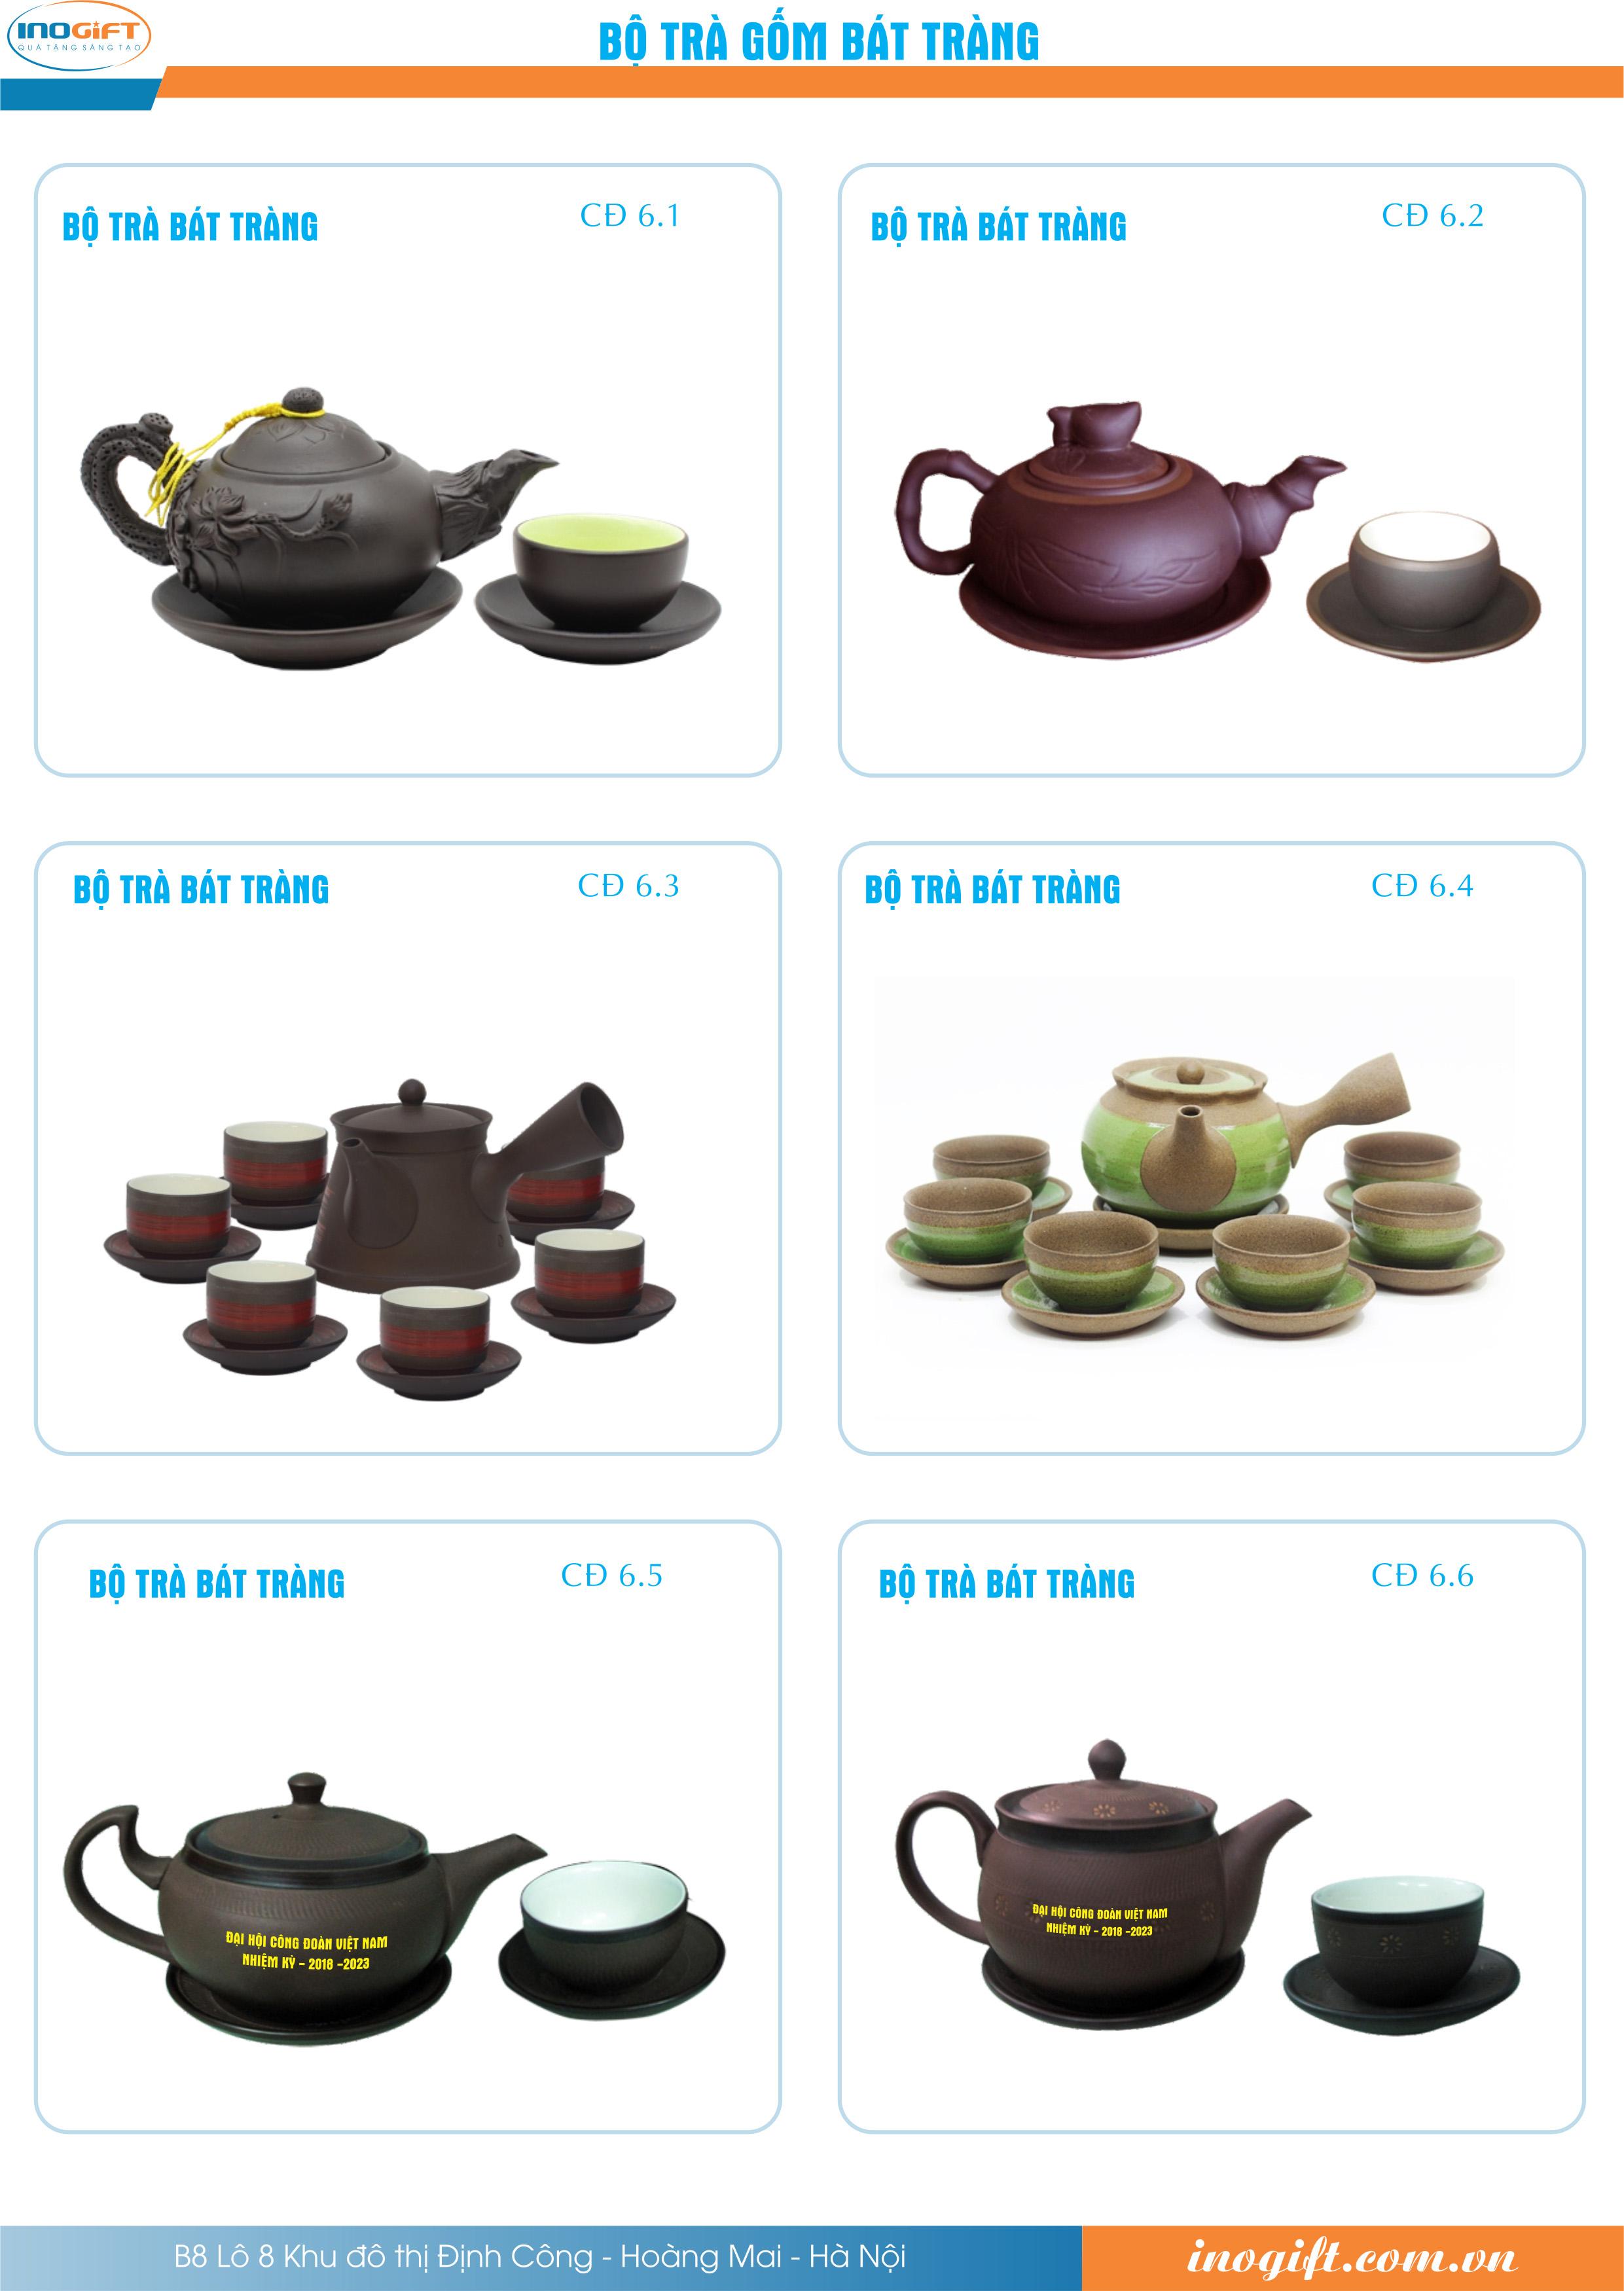 Market-qua-tang-dai-hoi-Cong-Doan-6